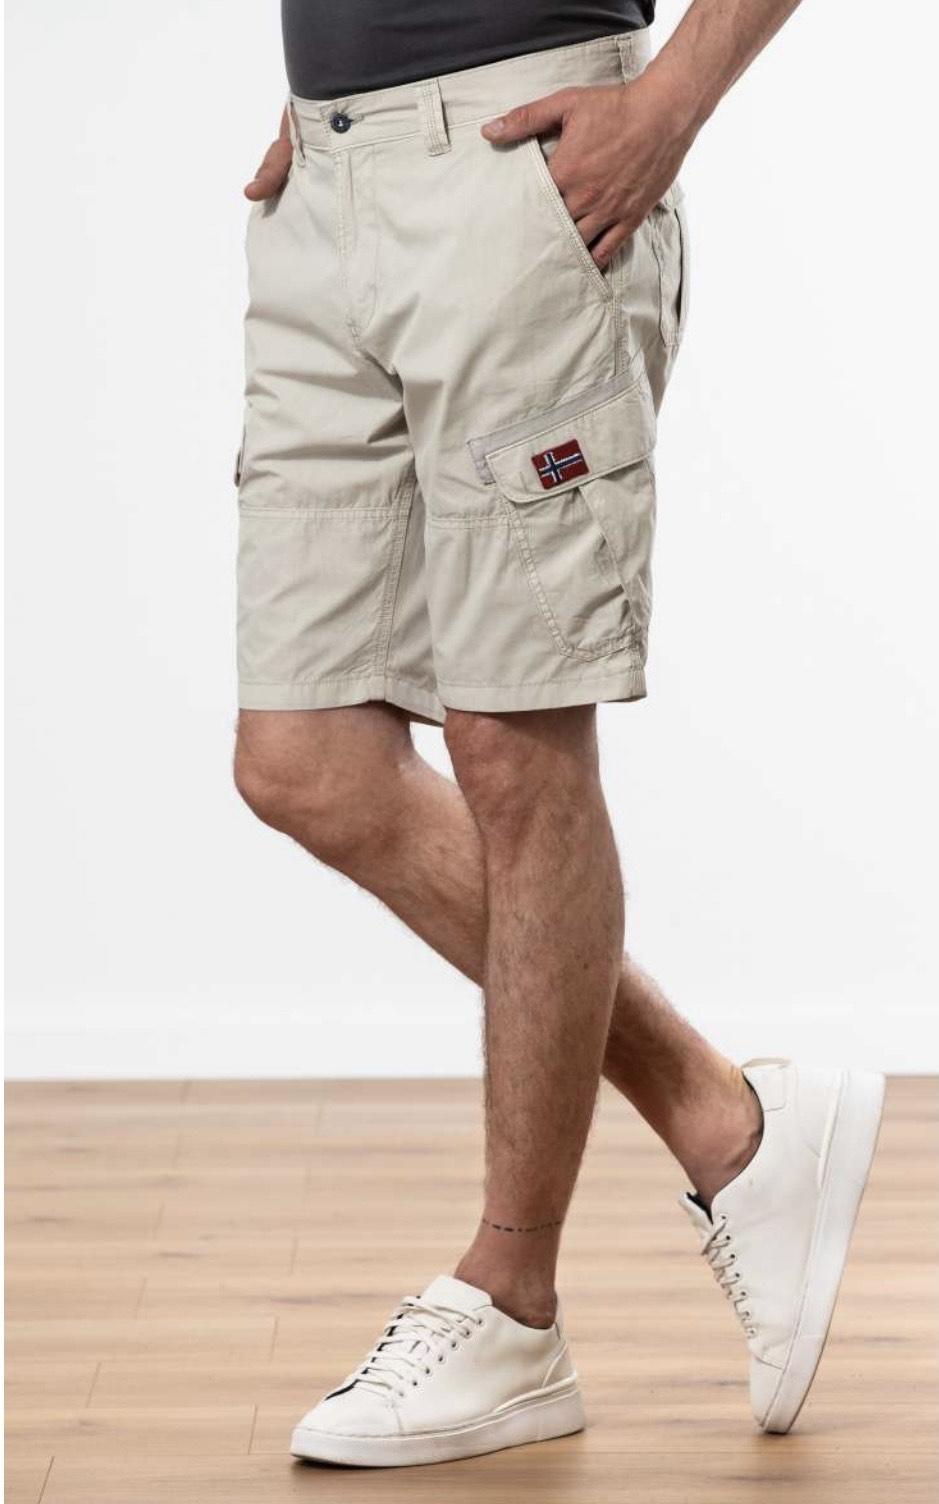 Napapijri Shorts mit Cargotaschen (UVP 89,99€)